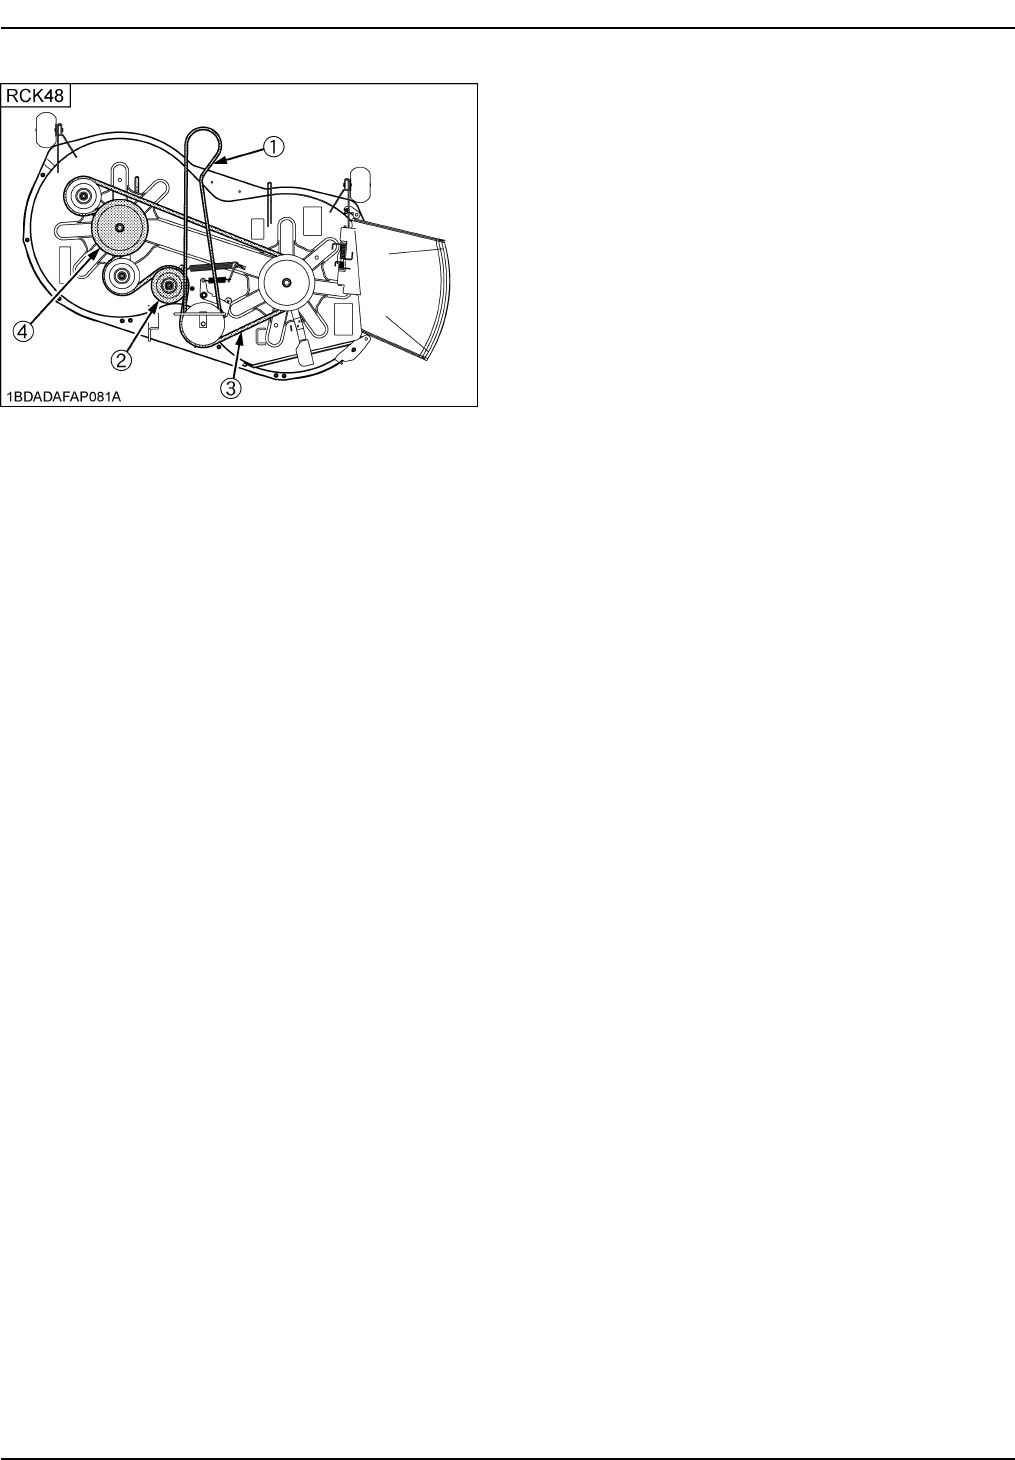 Astounding Handleiding Kubota T1880 Pagina 68 Van 78 English Wiring 101 Olytiaxxcnl